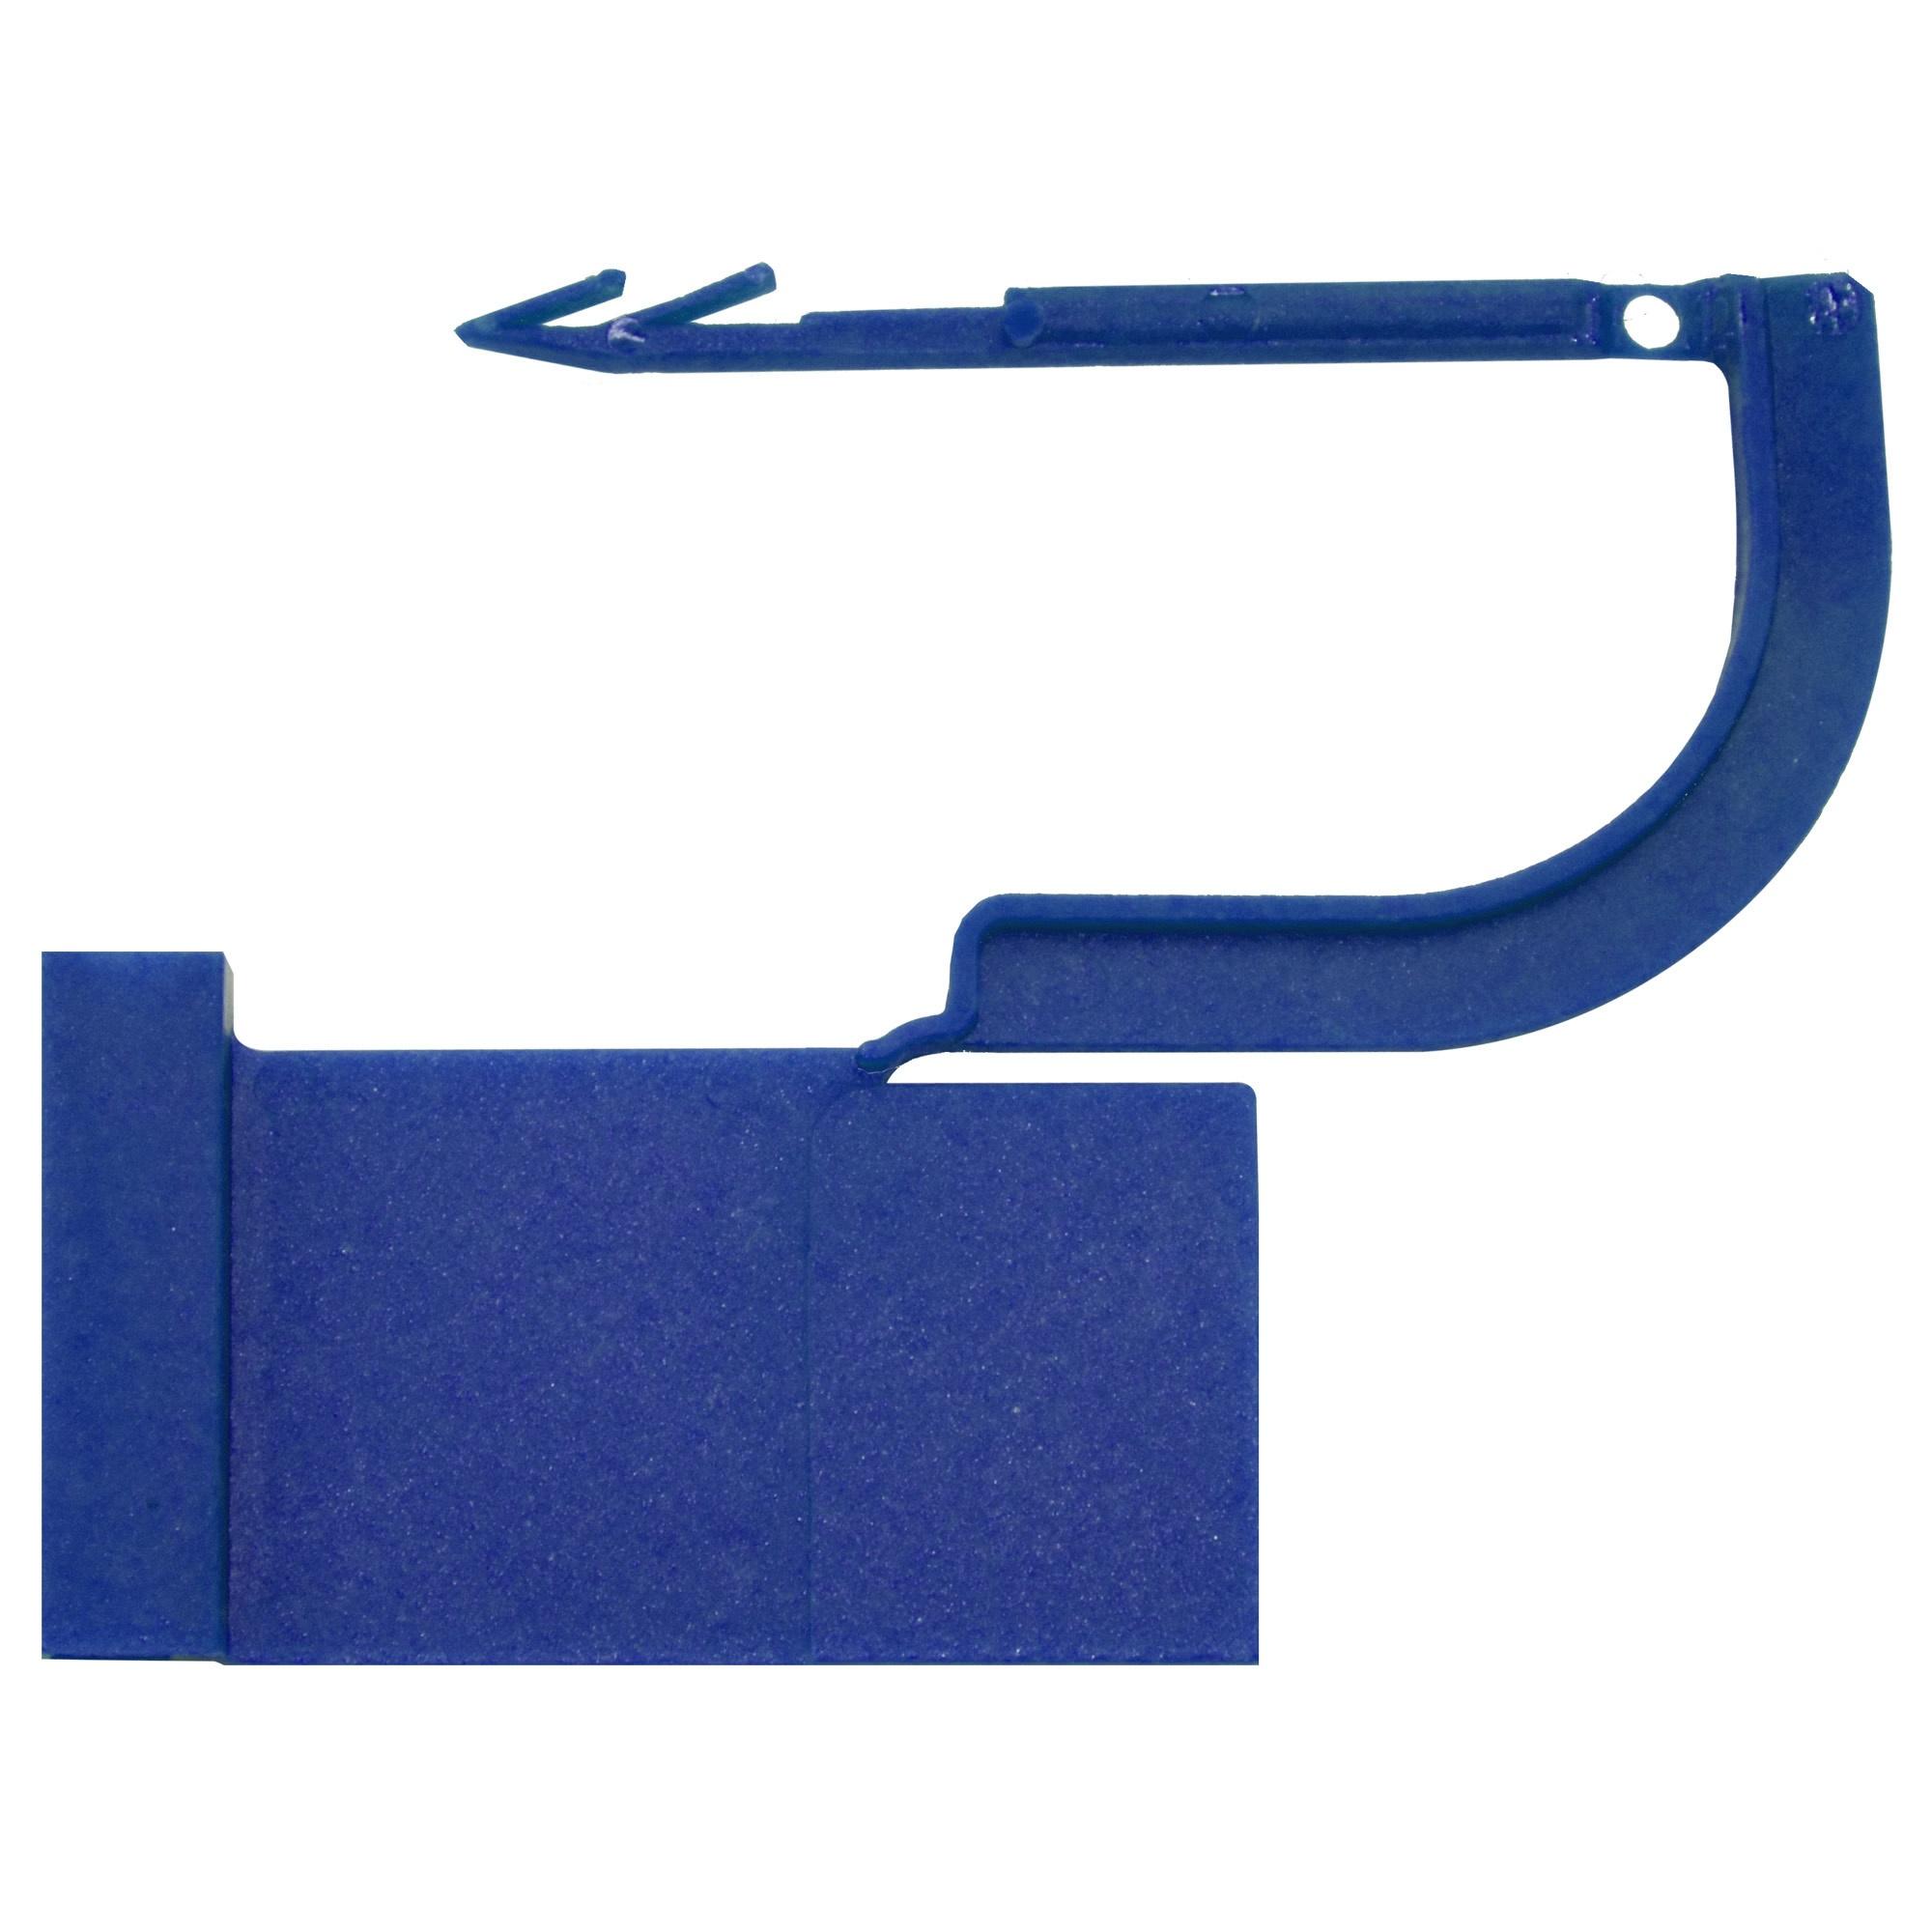 Universal Plastic Seal Unilock XL Image